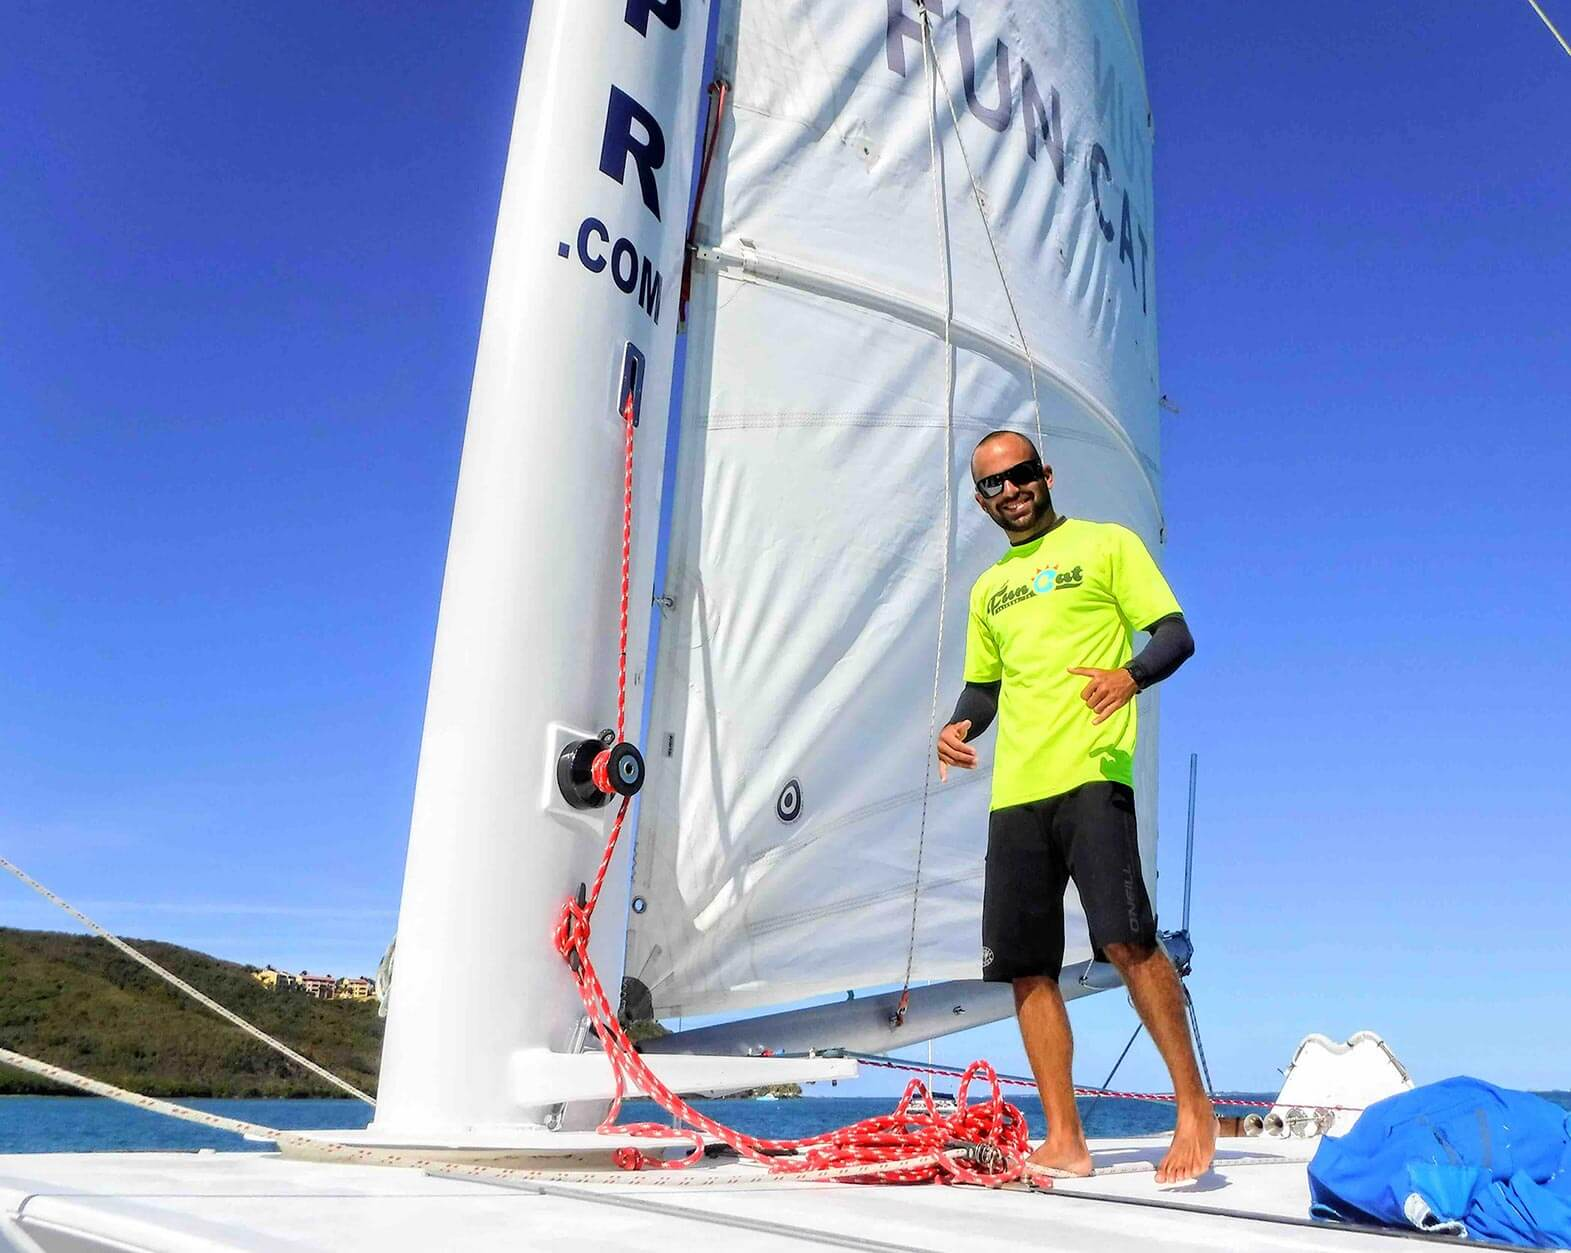 Man smiles next to the sail of the Fun Cat Catamaran Puerto Rico in Icacos Puerto Rico